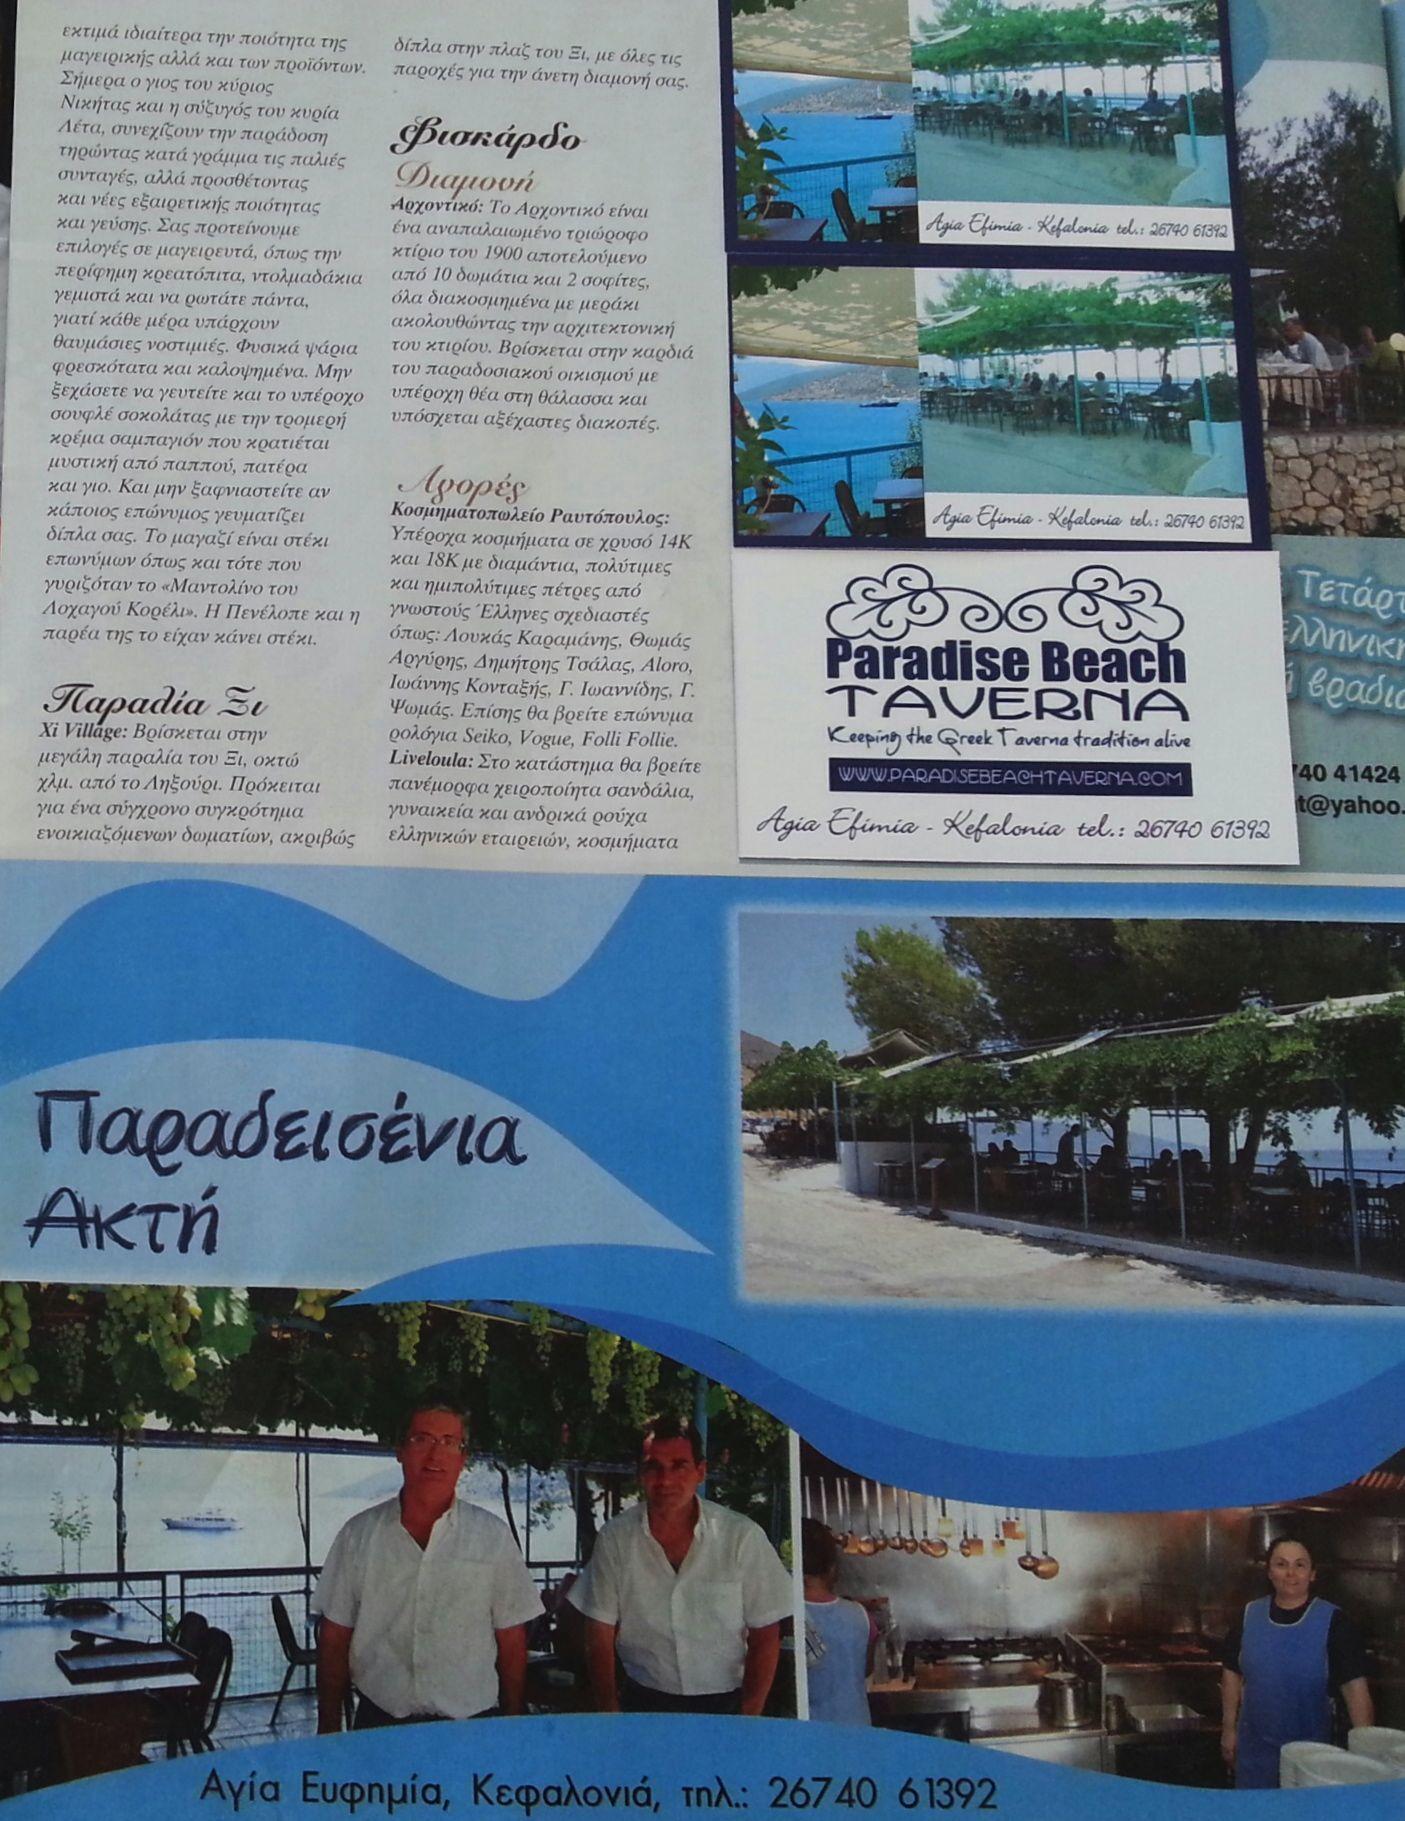 Ciao magazine 2 July 2014.jpg